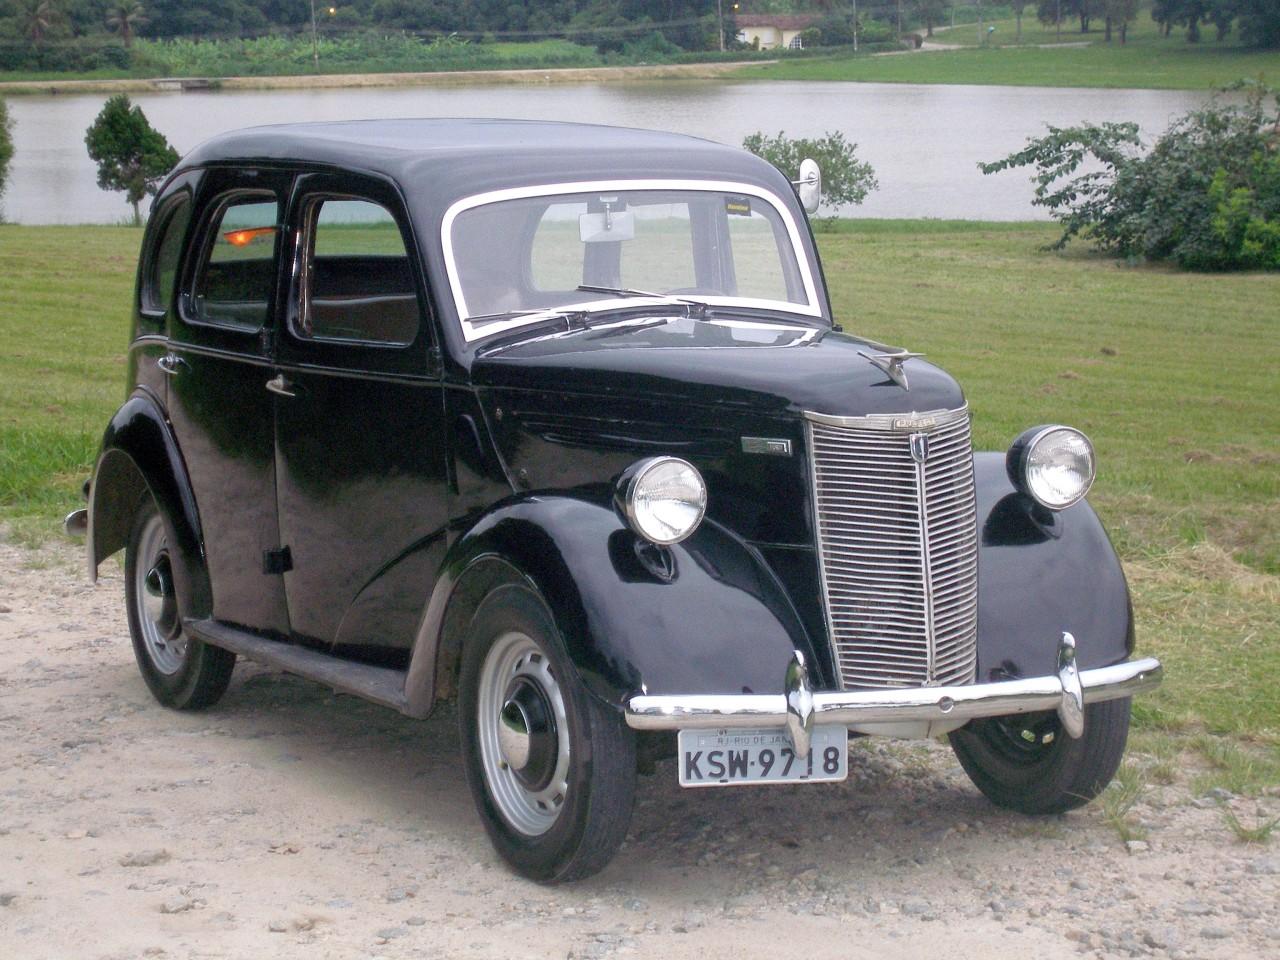 Old Ford cars - Random Photo (30971730) - Fanpop